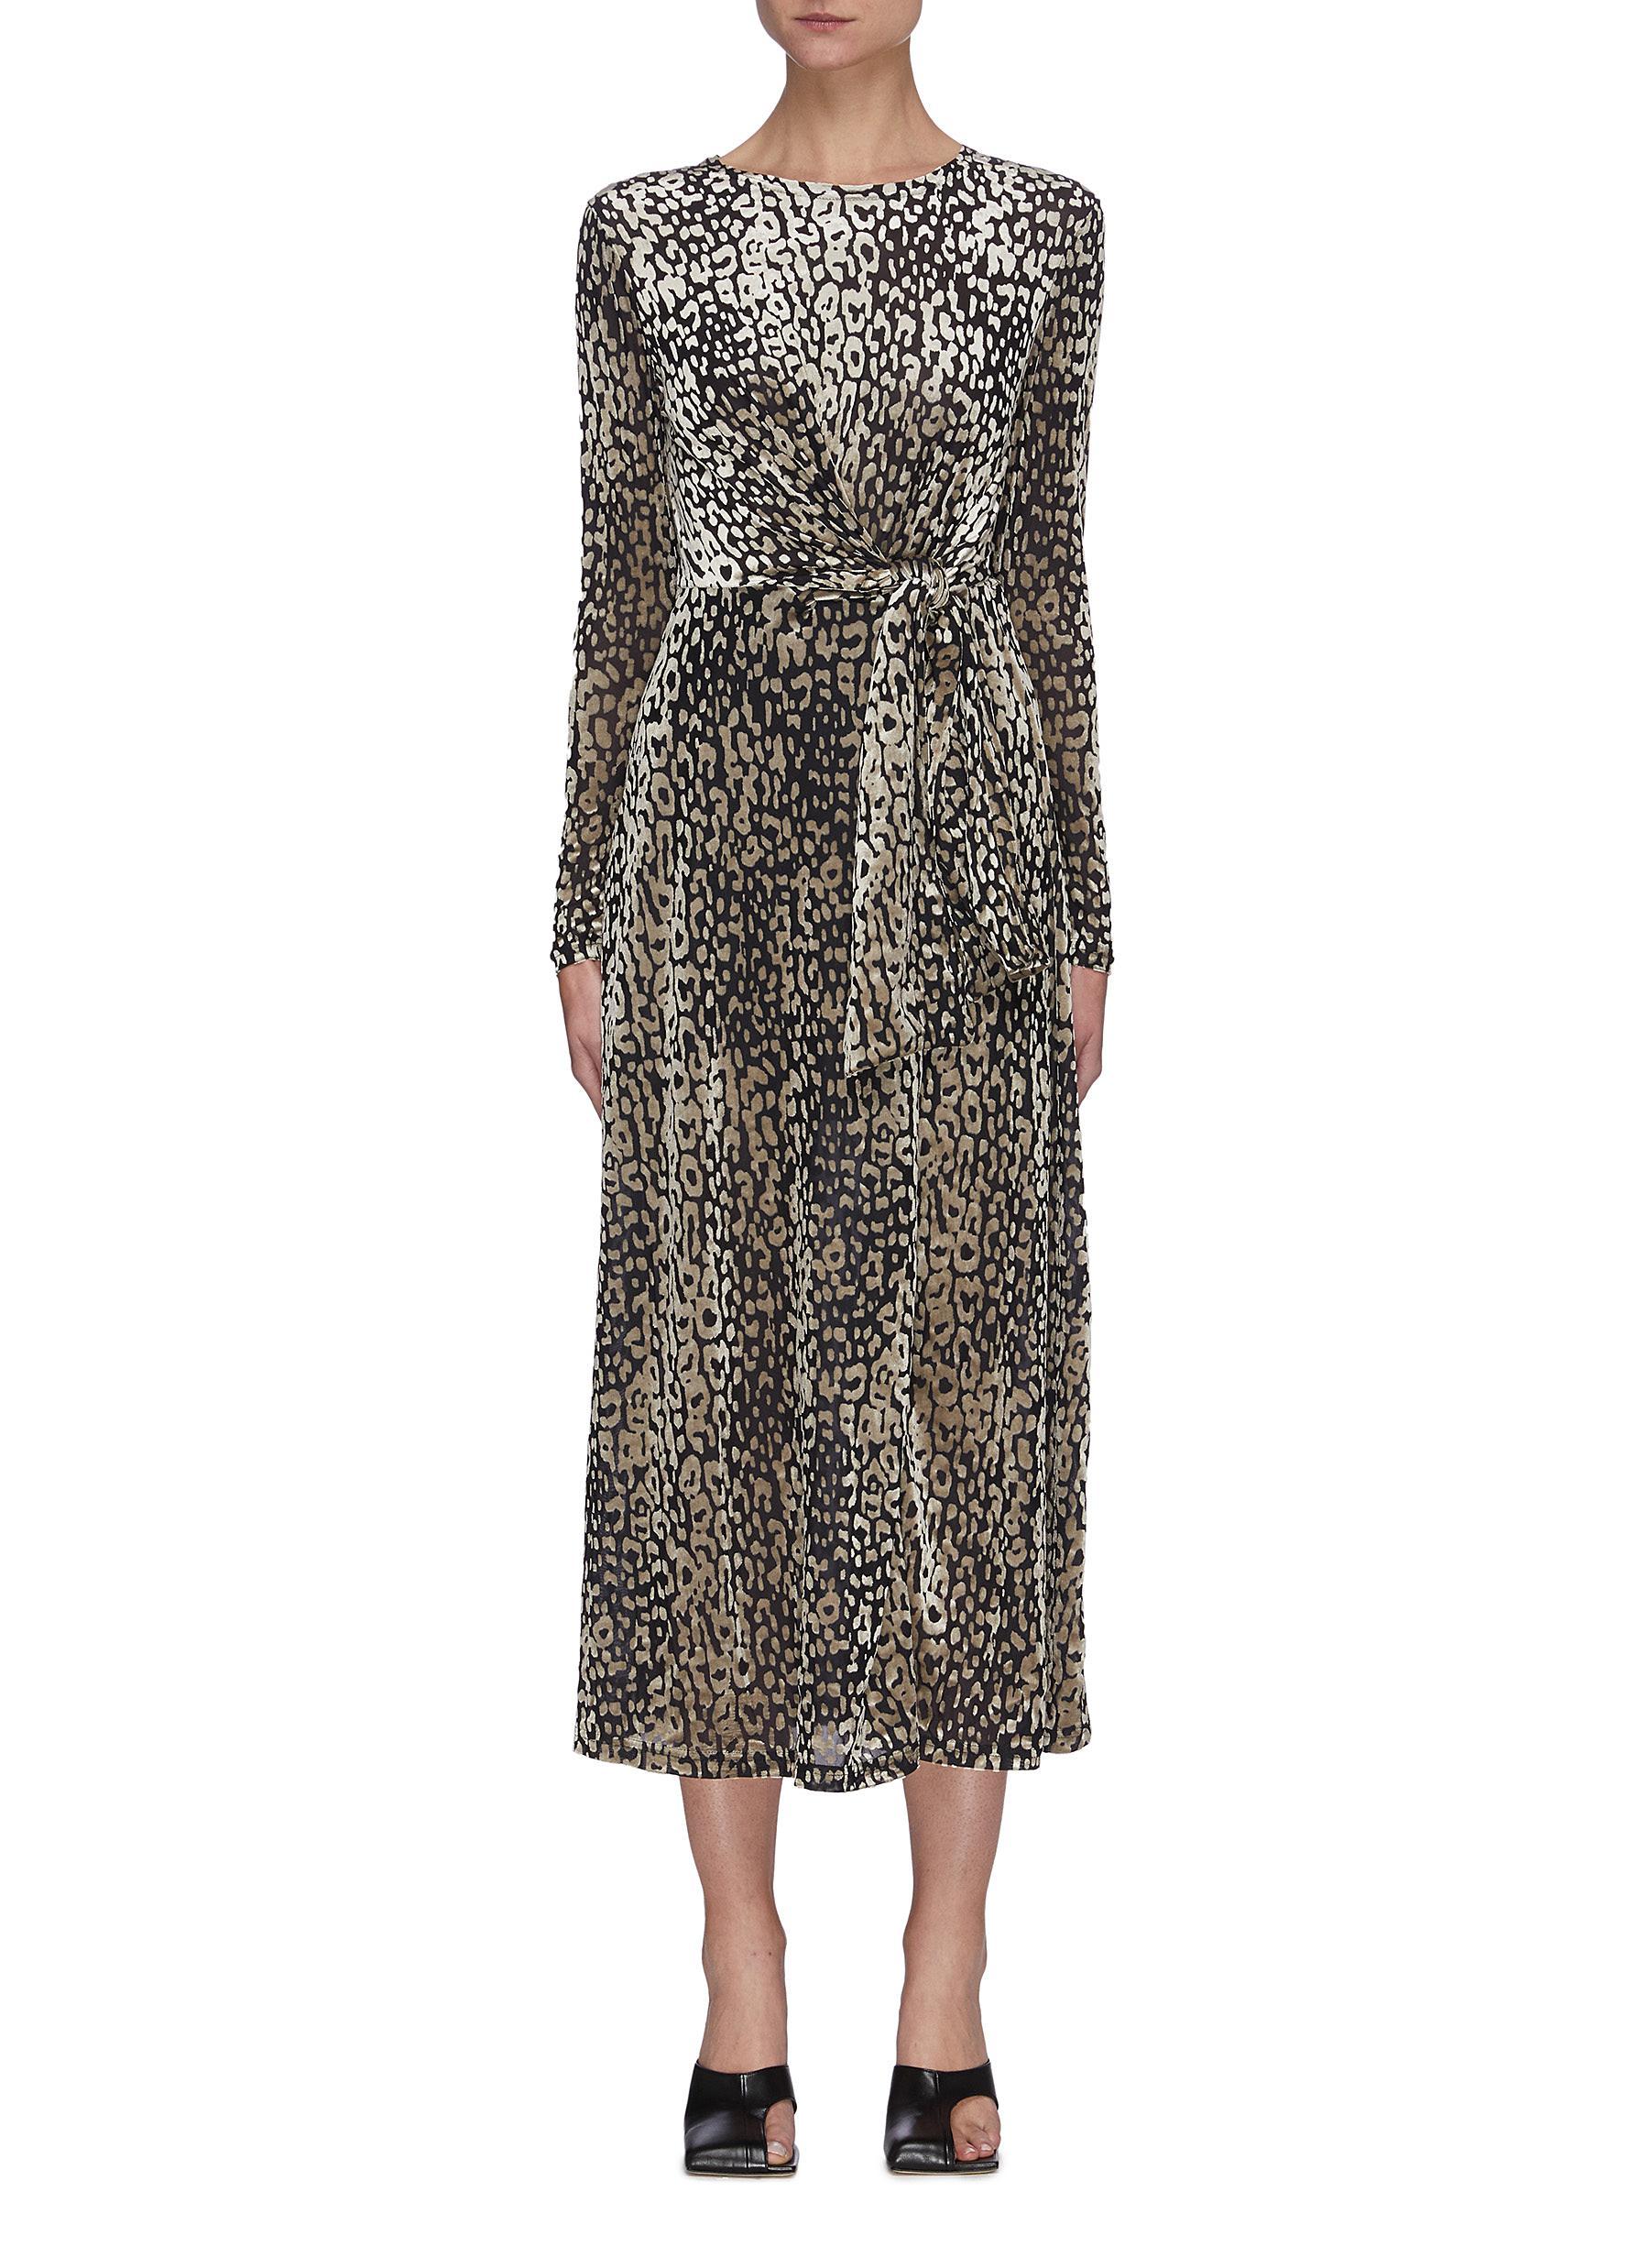 Instinctive' Leopard Print Waist Tie Midi Dress